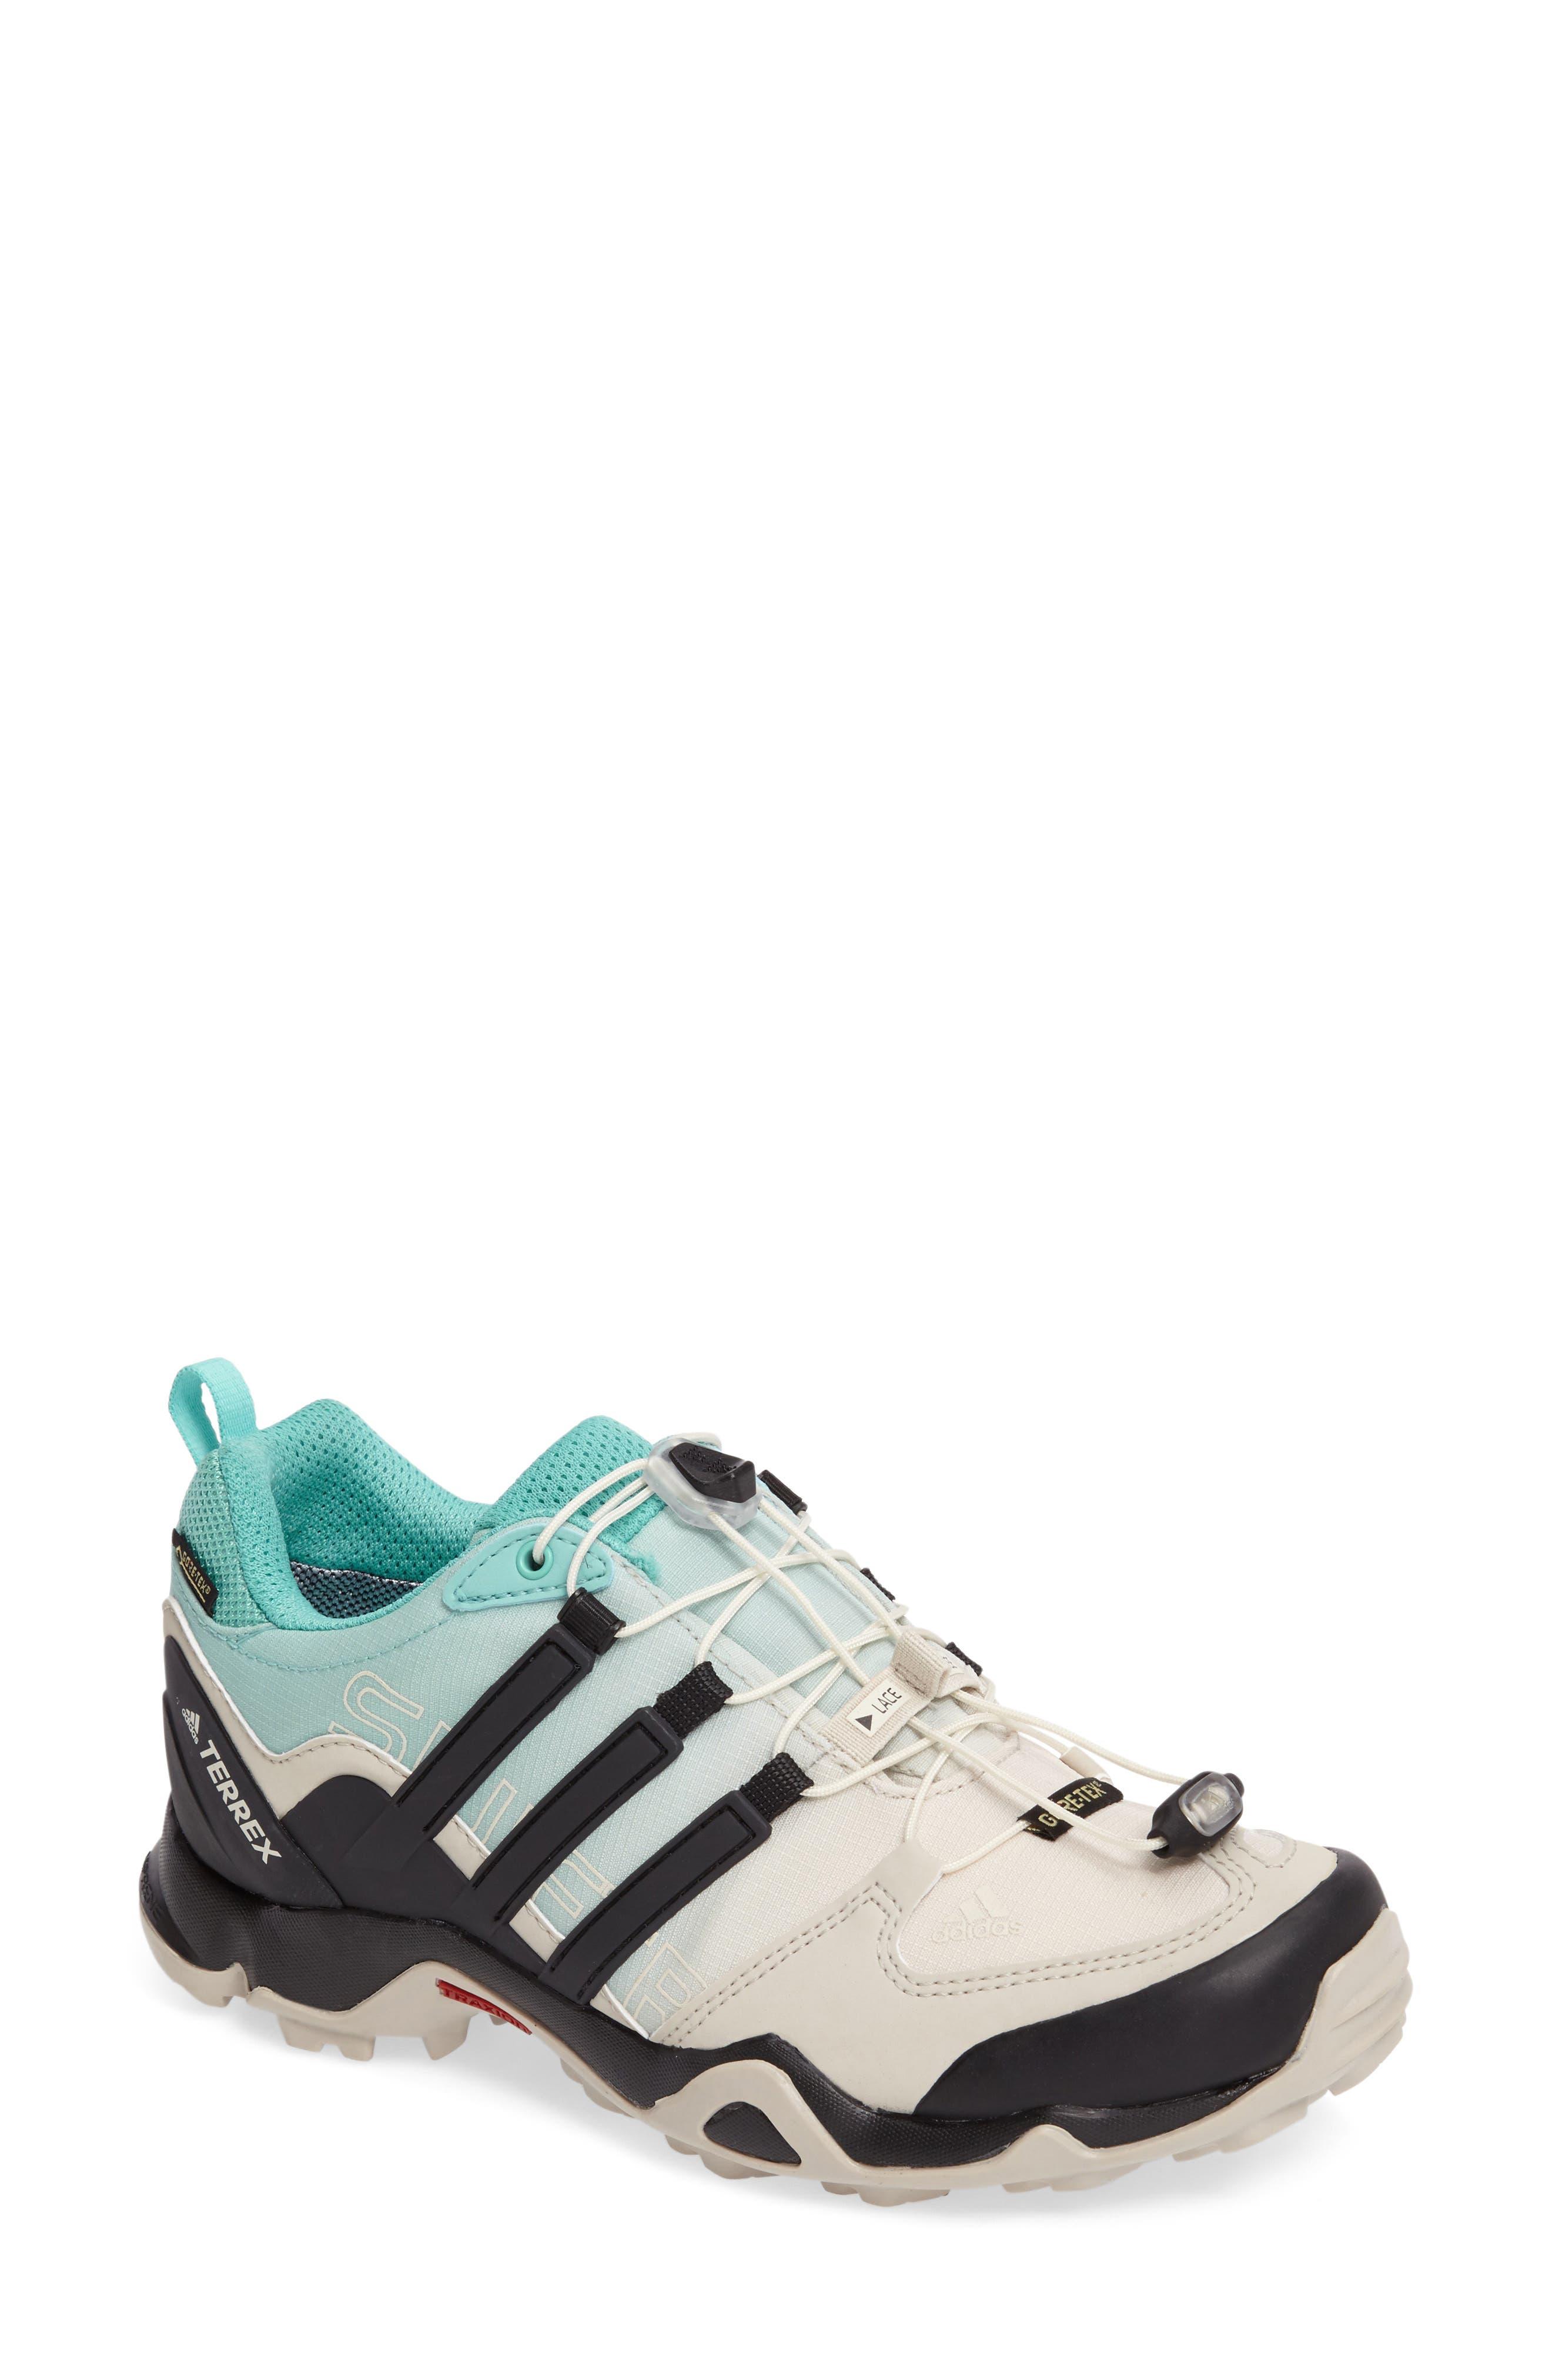 Terrex Swift R GTX Hiking Shoe,                         Main,                         color, Clear Brown/ Black/ Easy Mint